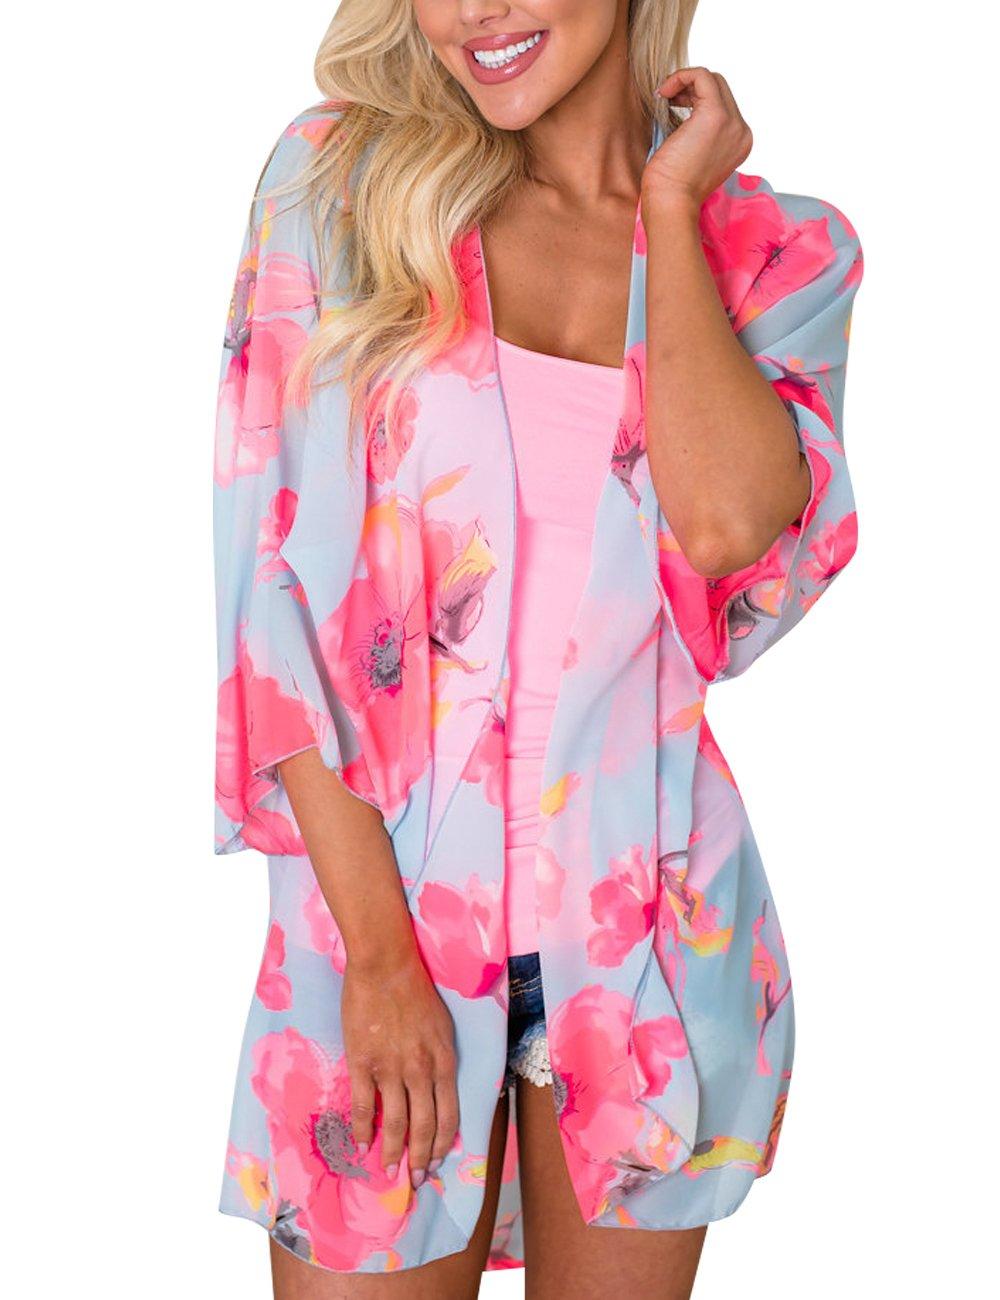 Yonala Summer Womens Beach Wear Cover up Swimwear Beachwear Bikini Cardigan One Size cover ups-001